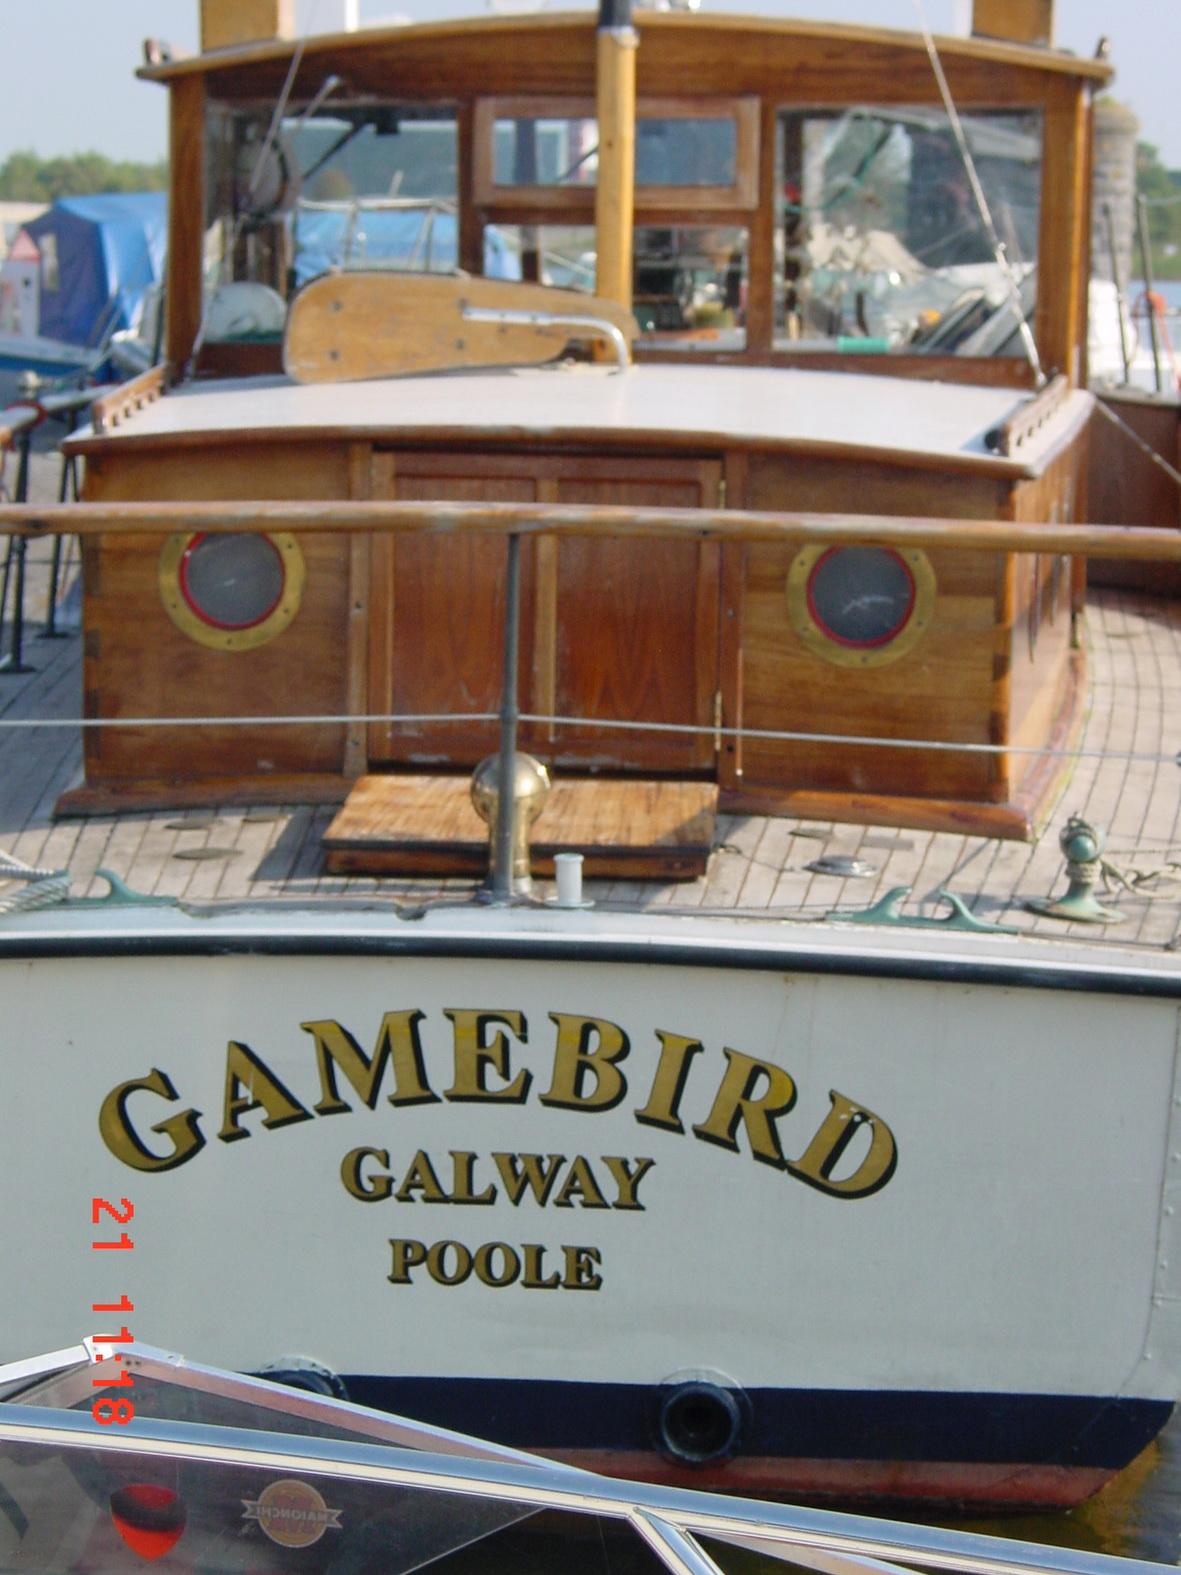 Gamebird again